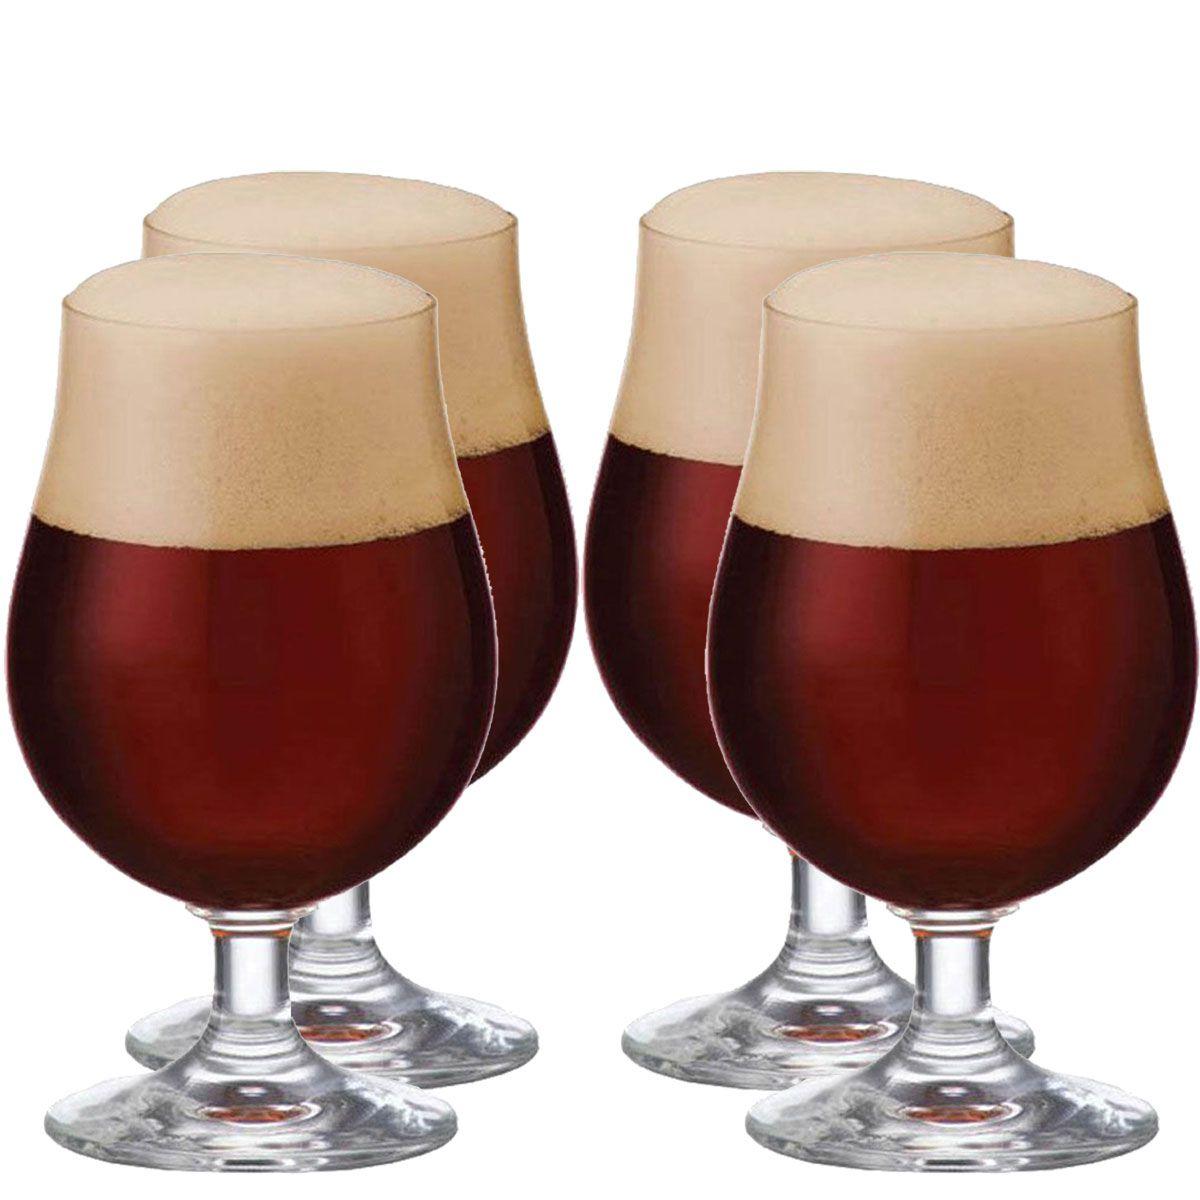 Jogo de Taça de Cerveja Bock Cristal 380ml 4 Pcs